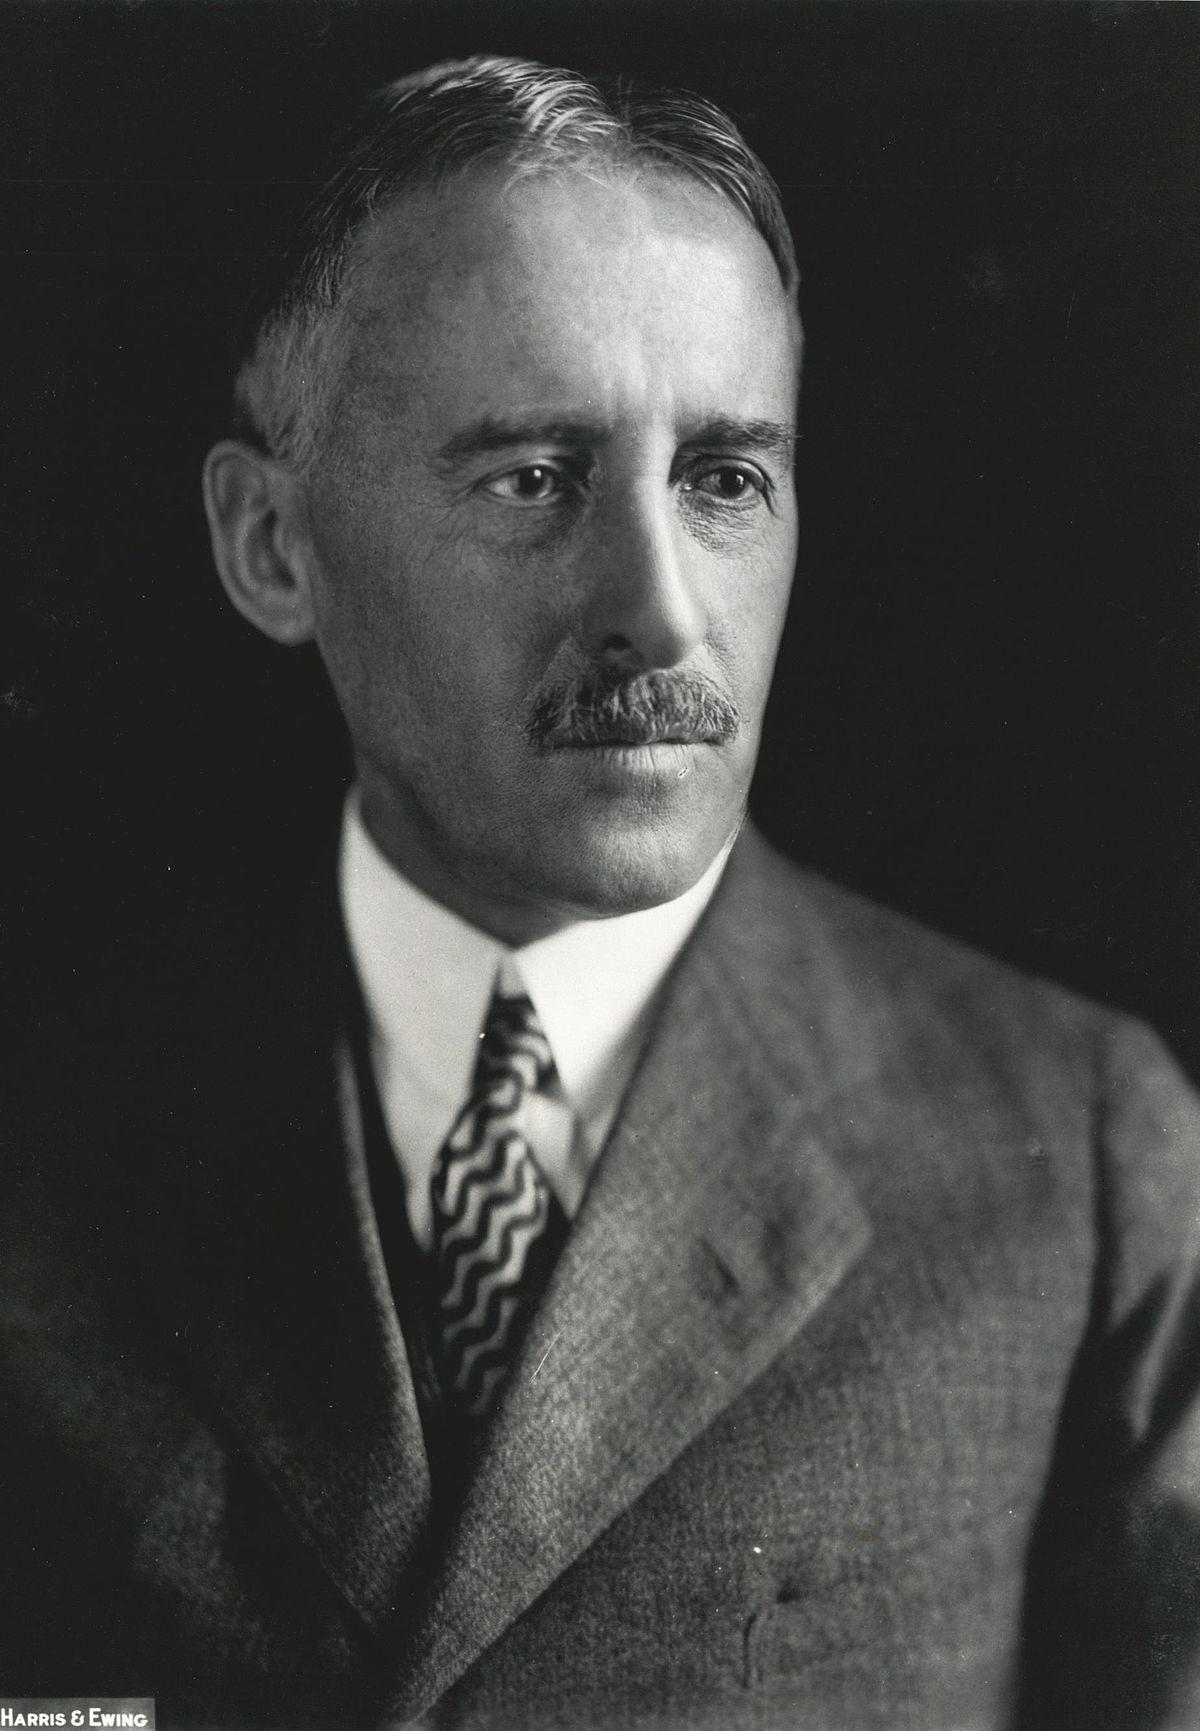 1200px-Henry_Stimson__Harris_&_Ewing_bw_photo_portrait__1929